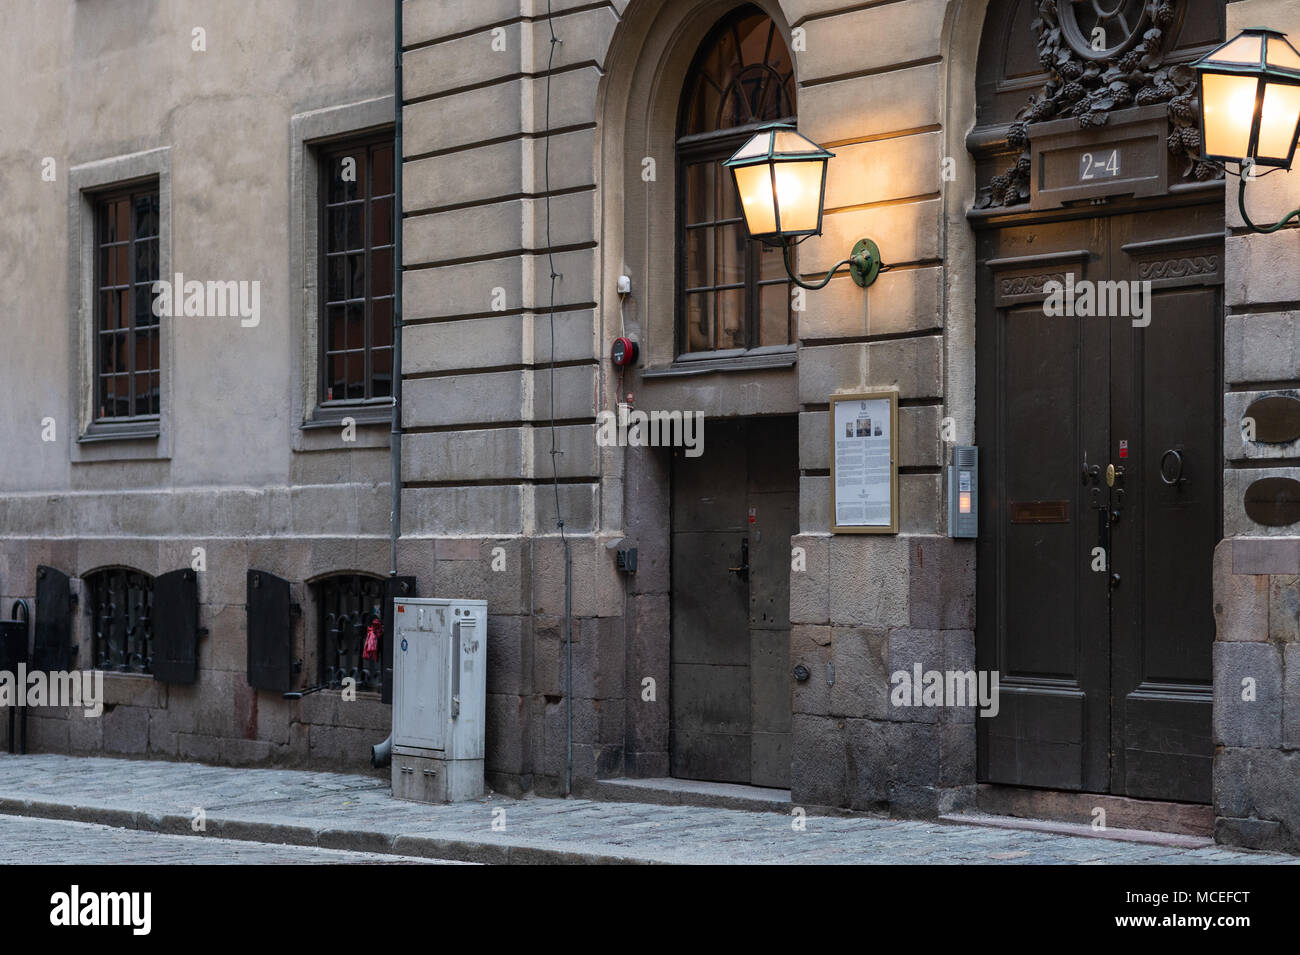 Stockholm, Sweden, 15th April, 2018. The Swedish Academy, Old Town, Stockholm. - Stock Image